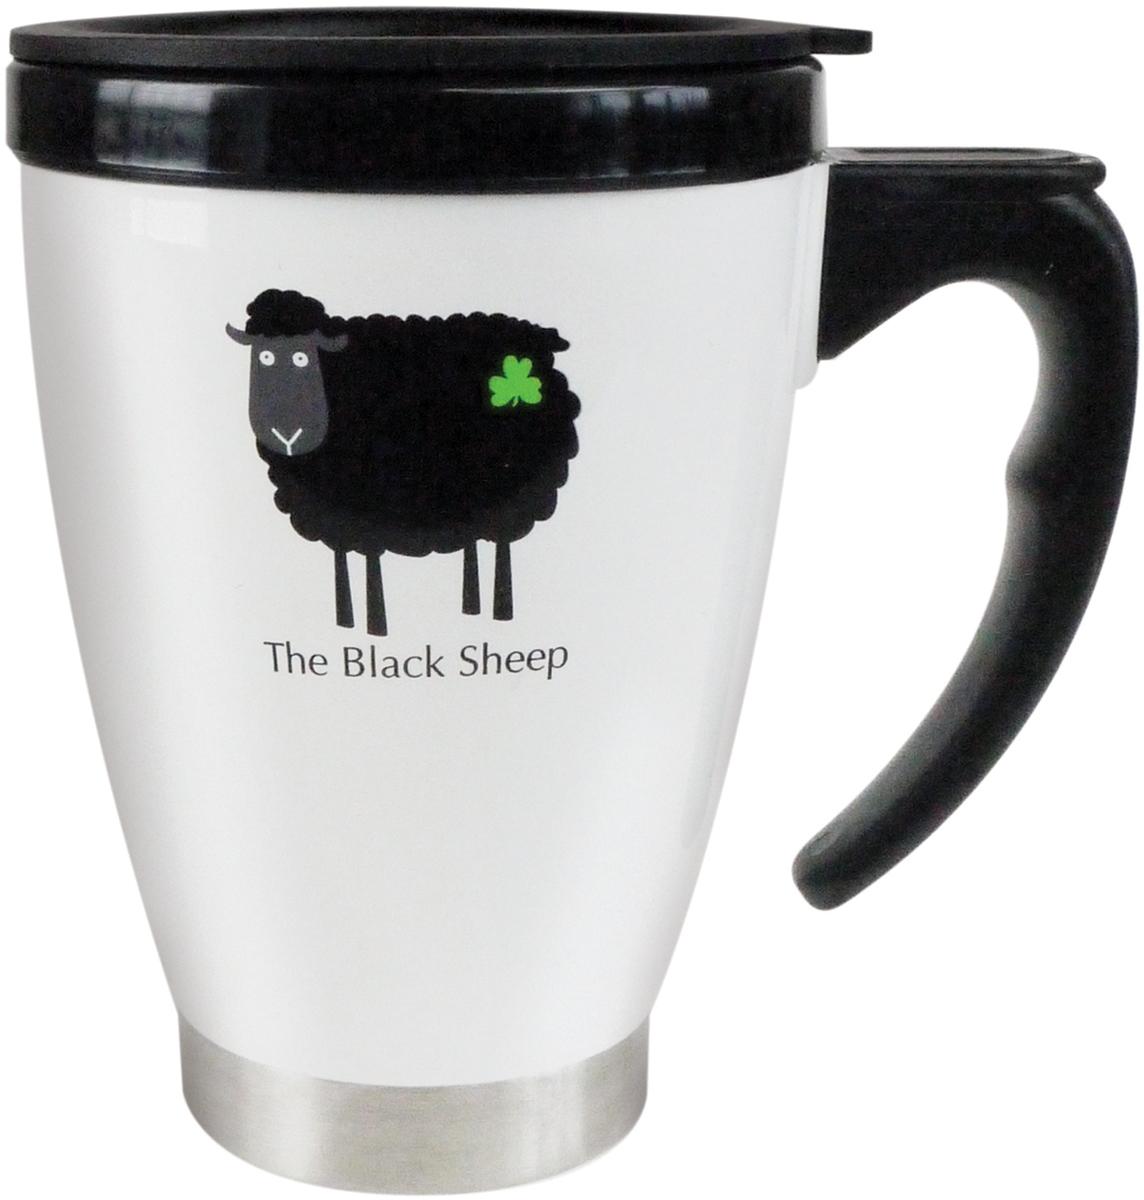 The Black Sheep Travel Mug